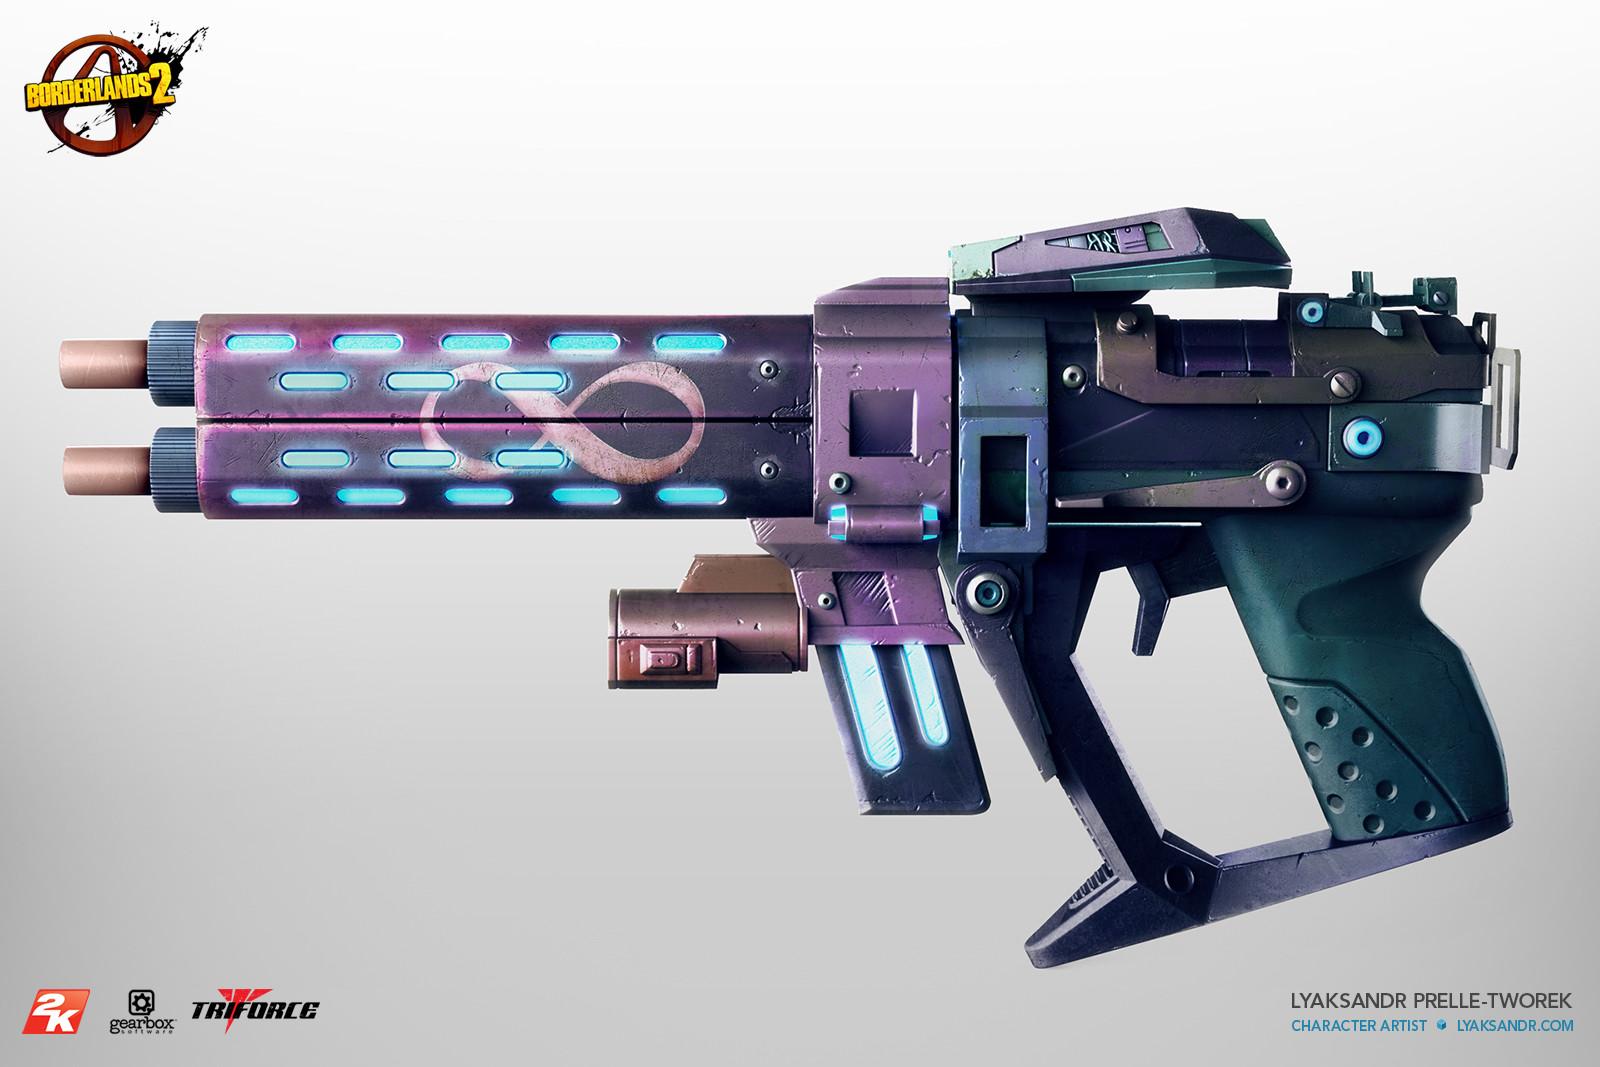 Lyaksandr prelle tworek infinity pistol website side